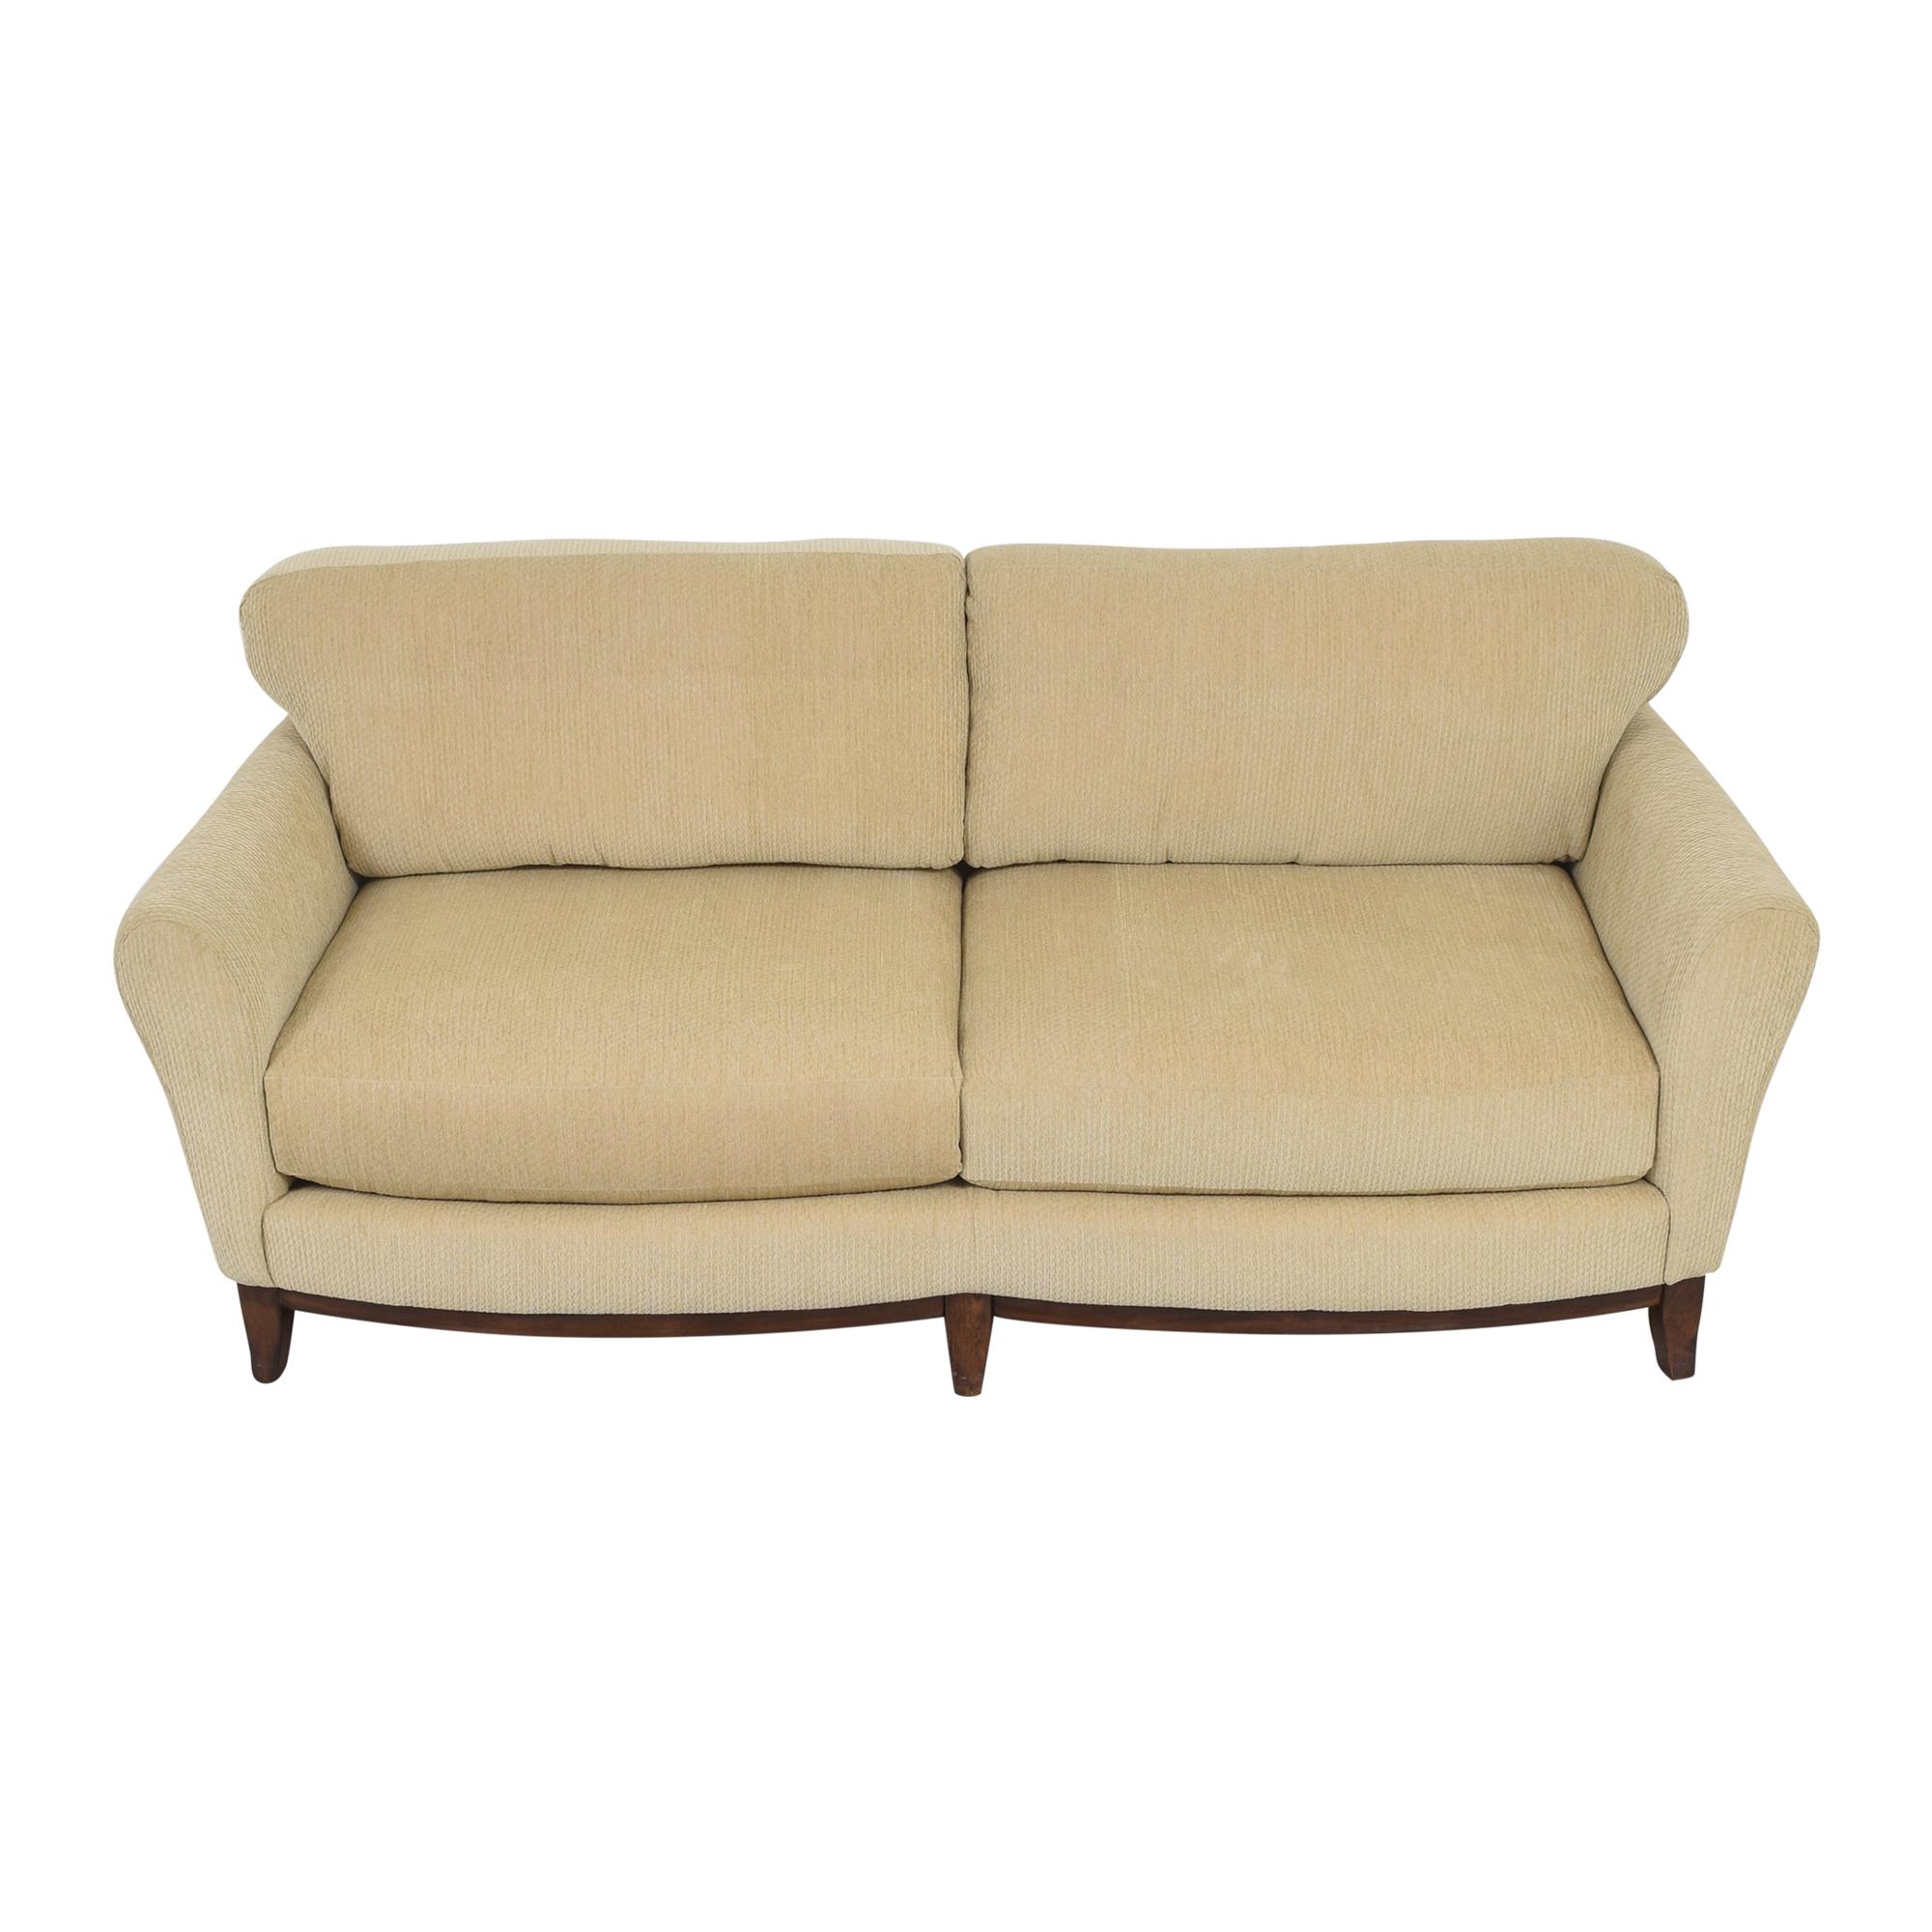 Two Cushion Sofa / Sofas